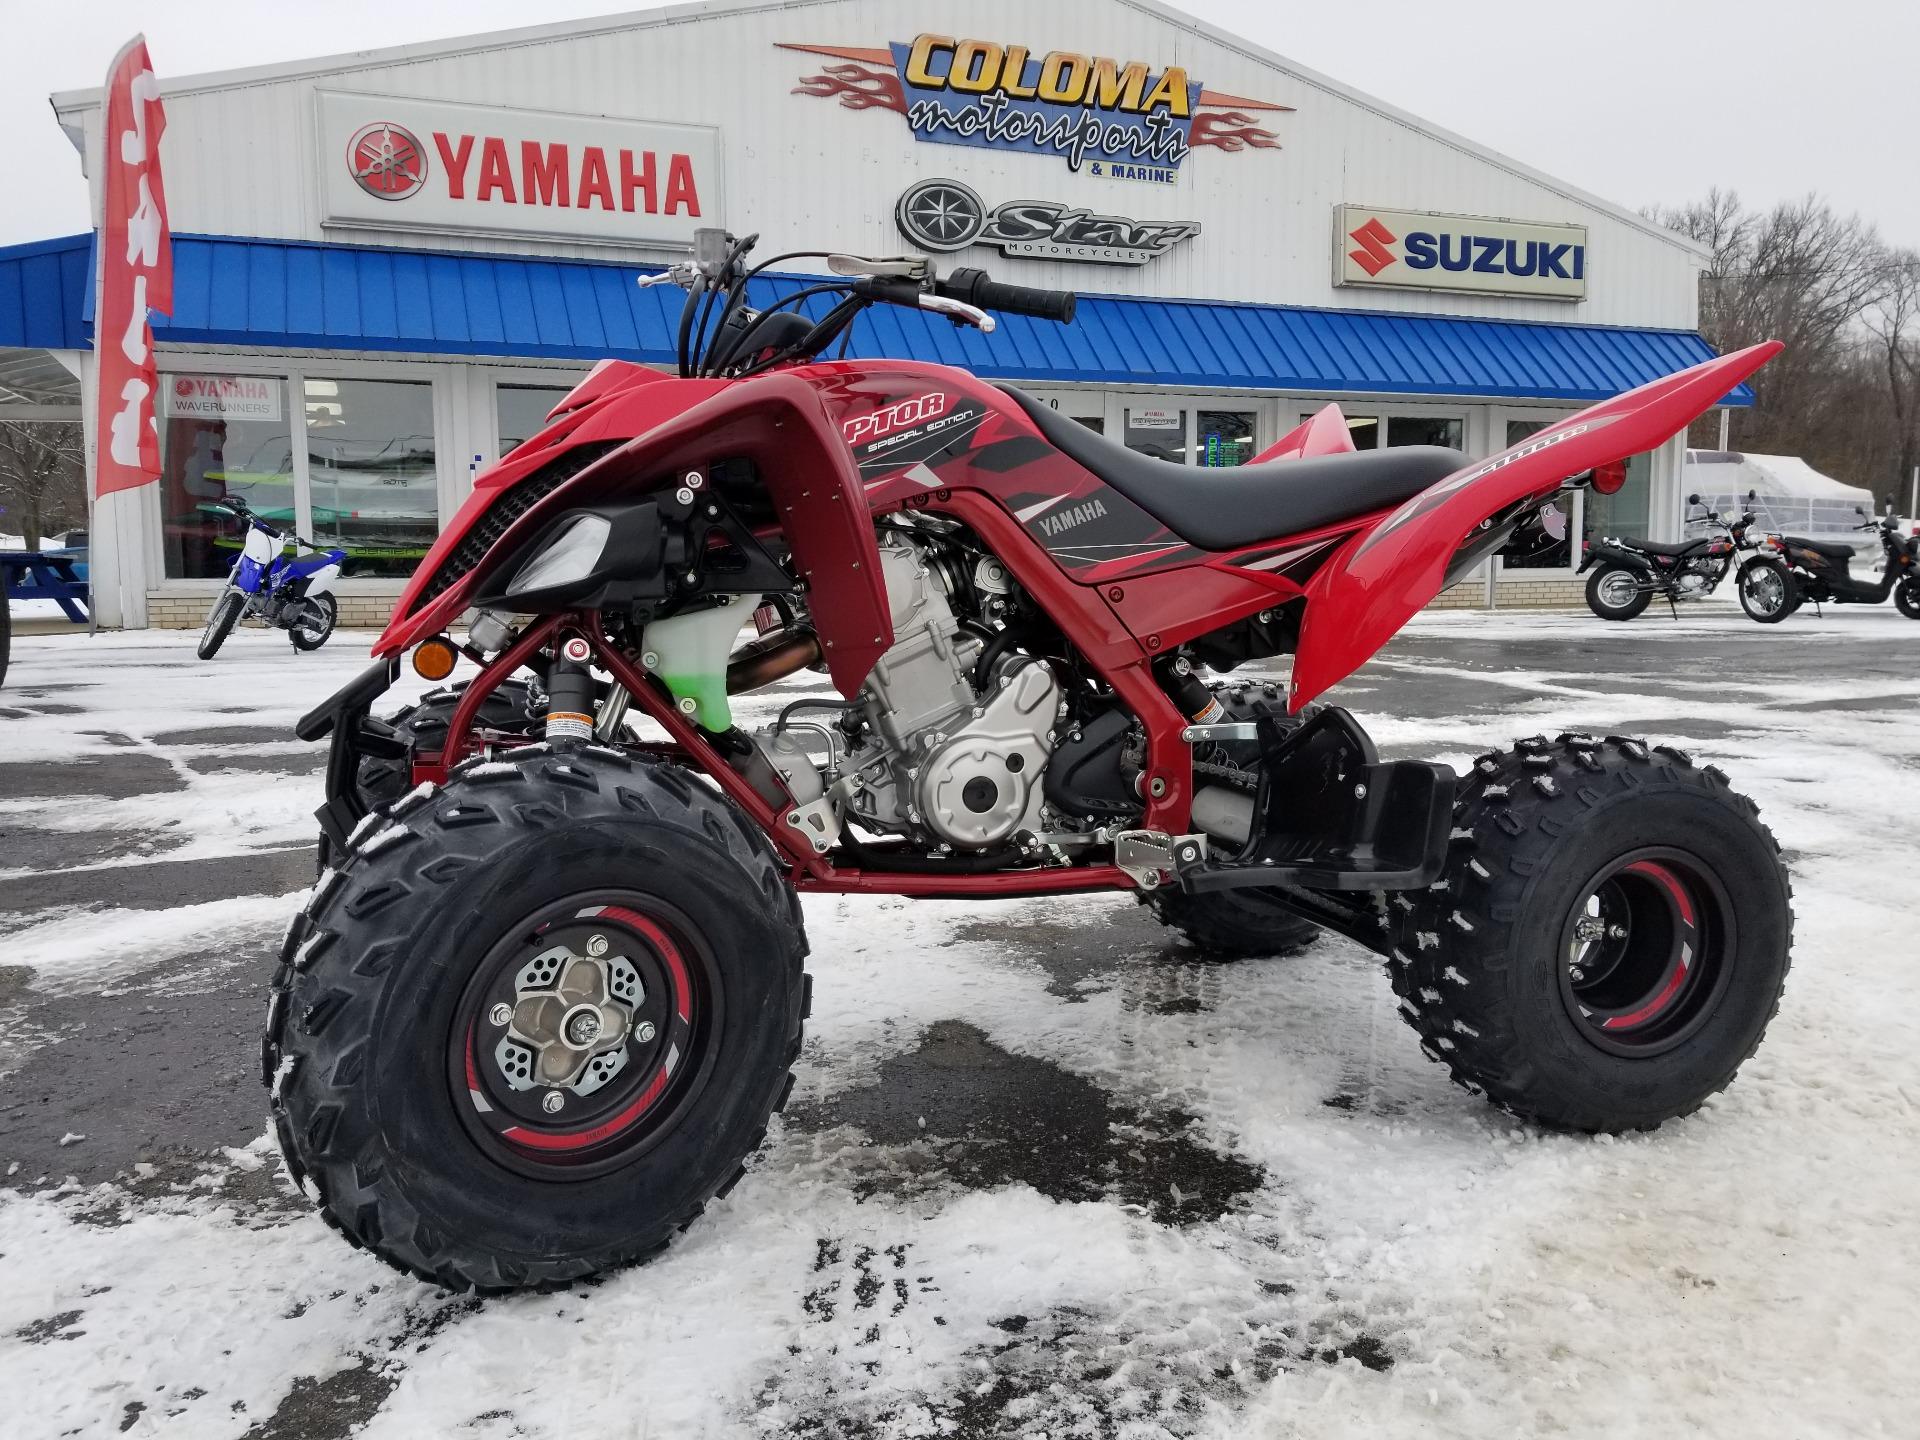 bc9d3036aaaa New 2019 Yamaha Raptor 700R SE ATVs in Coloma